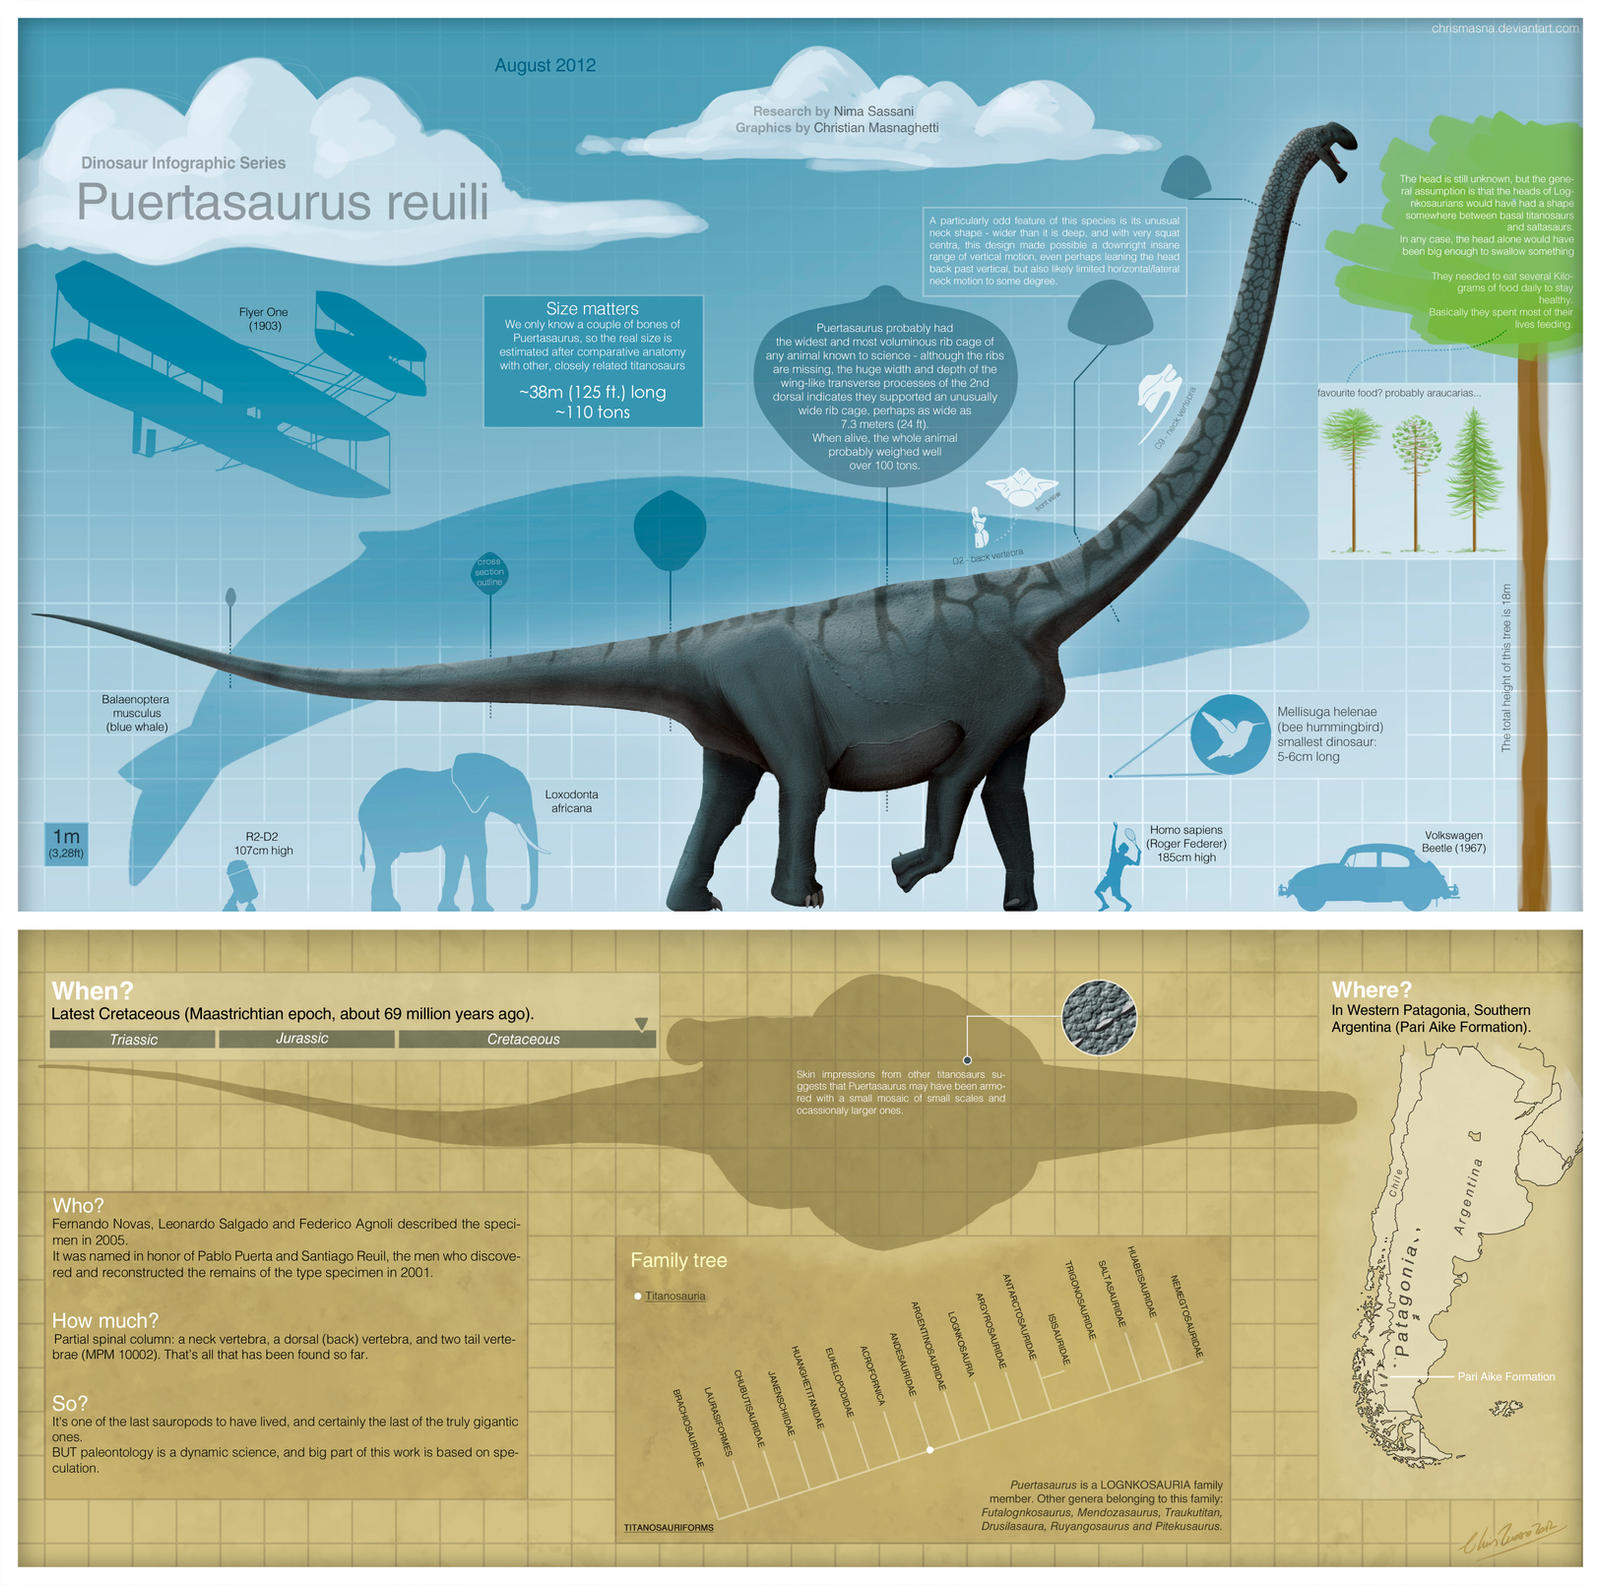 The Biggest - Puertasaurus reuili